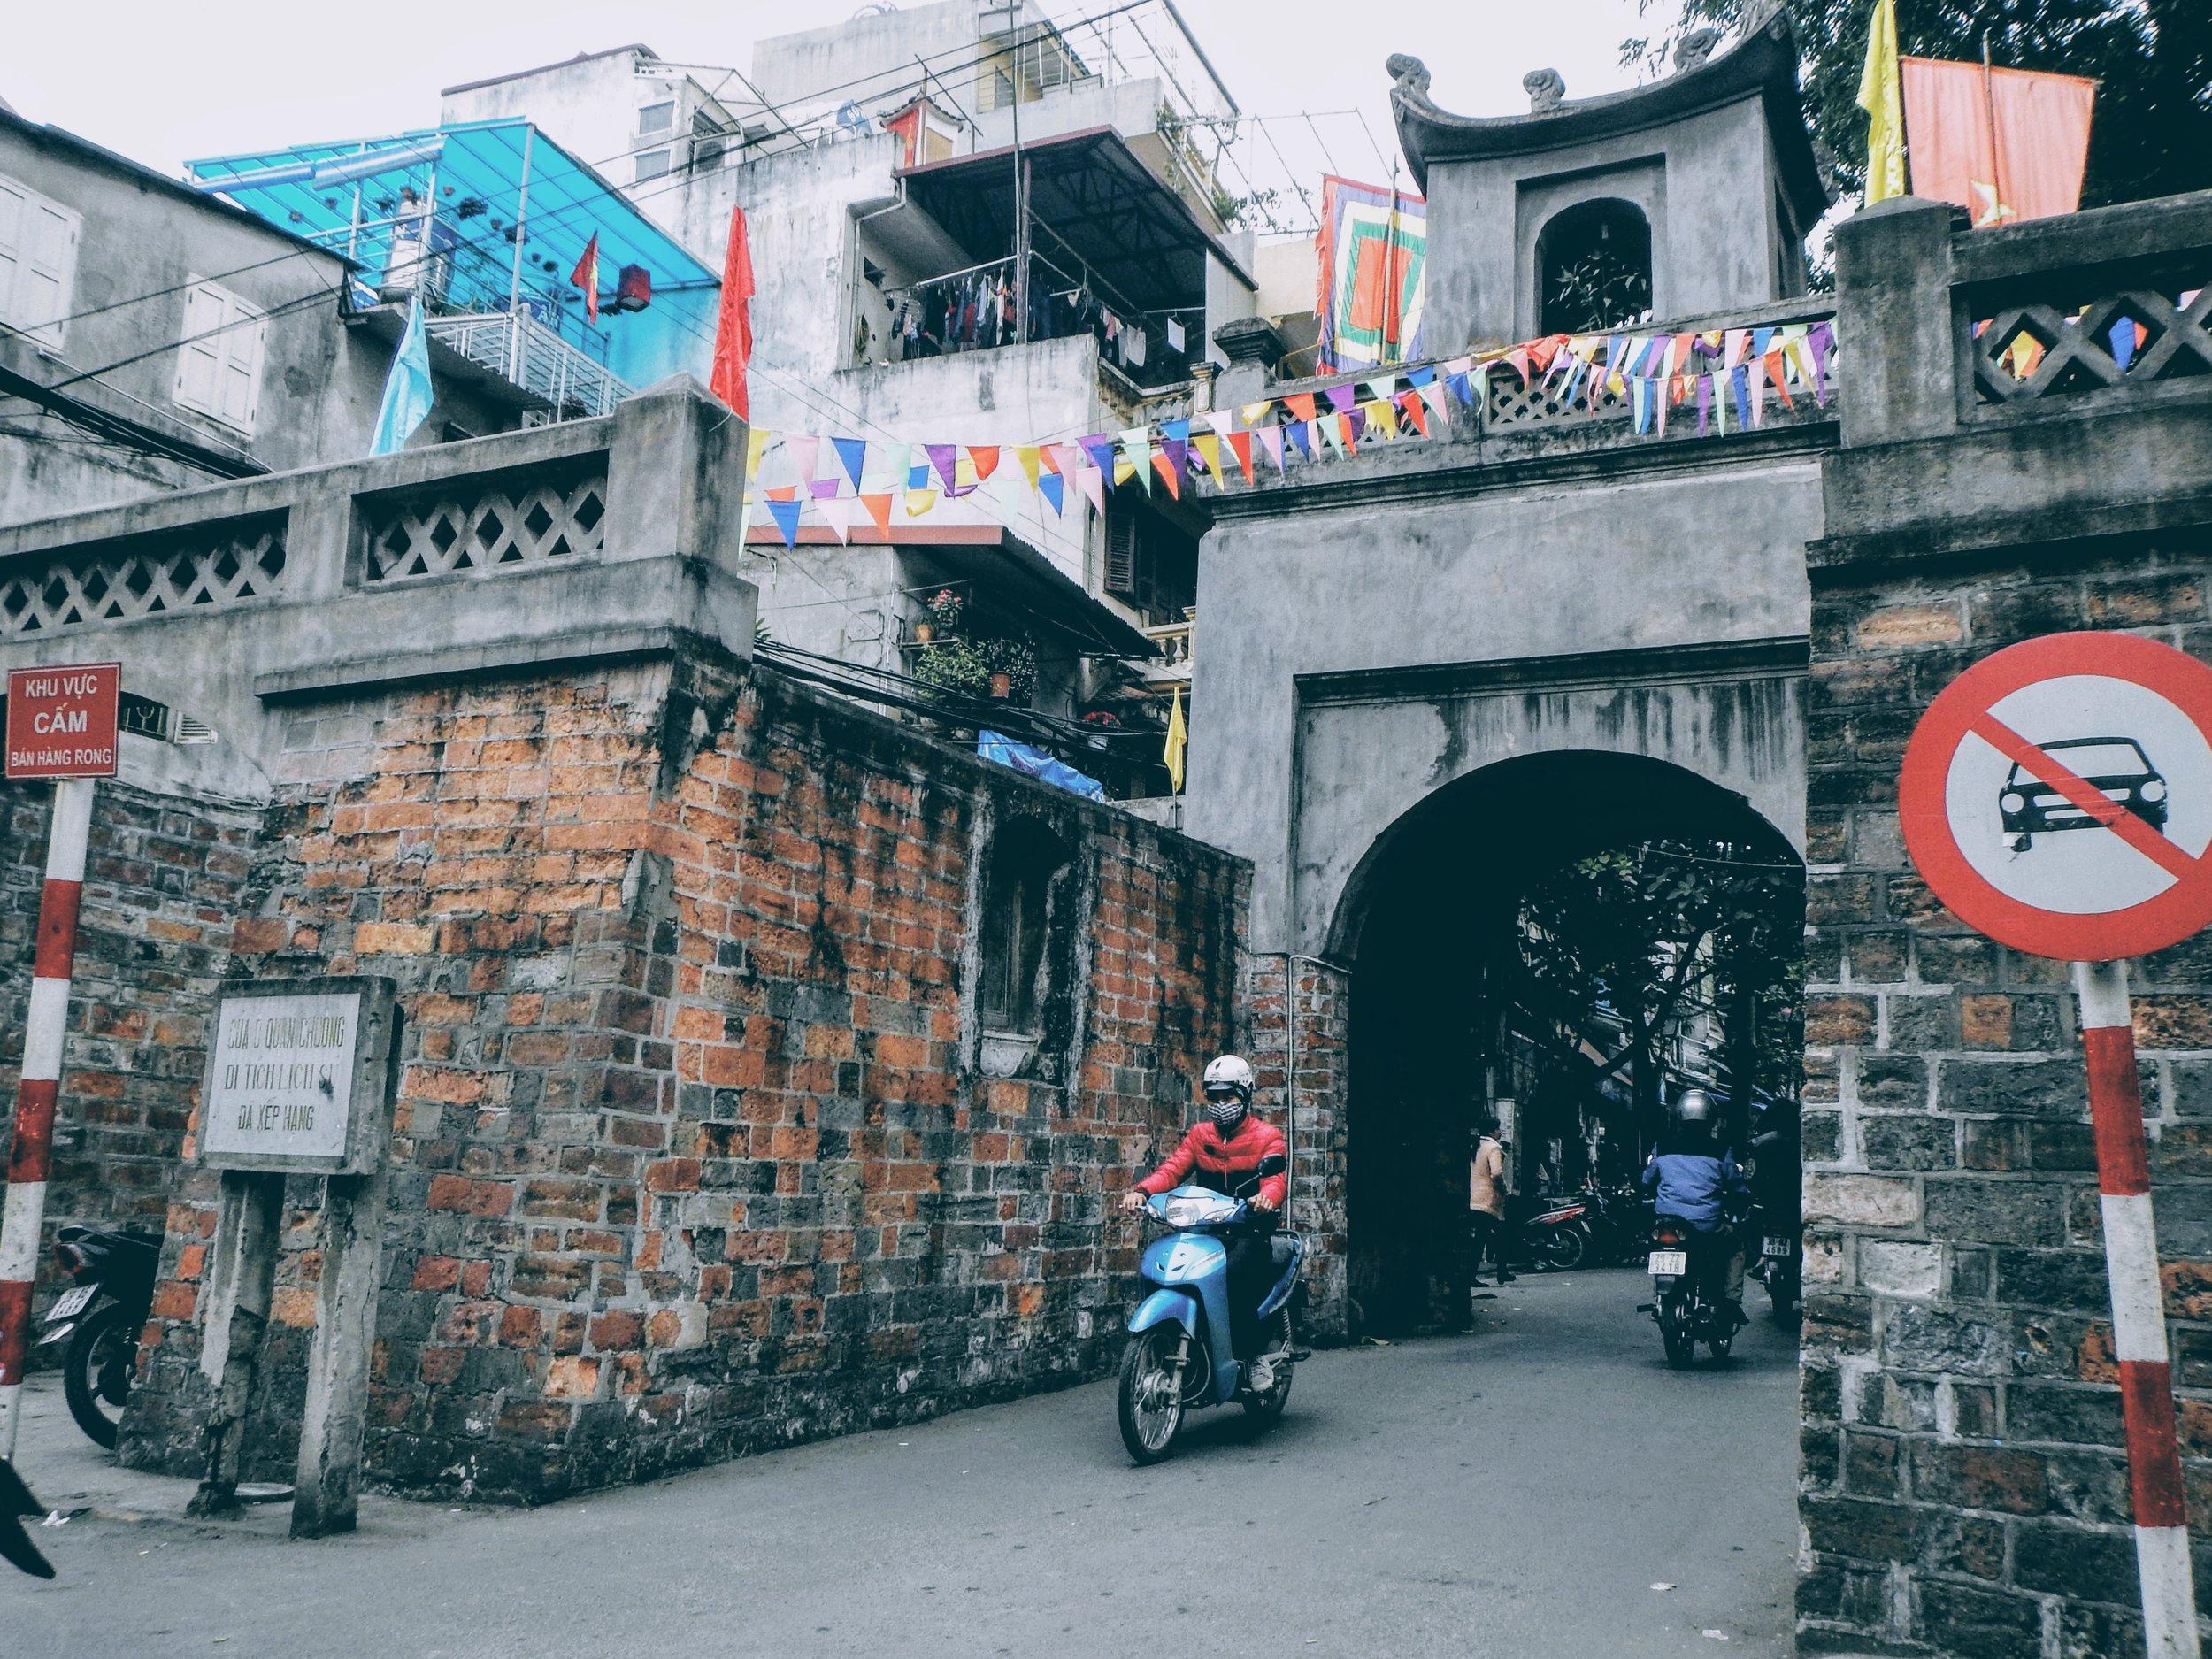 The Weekly Getaway: motorbikes, smog and amazing food in Hanoi